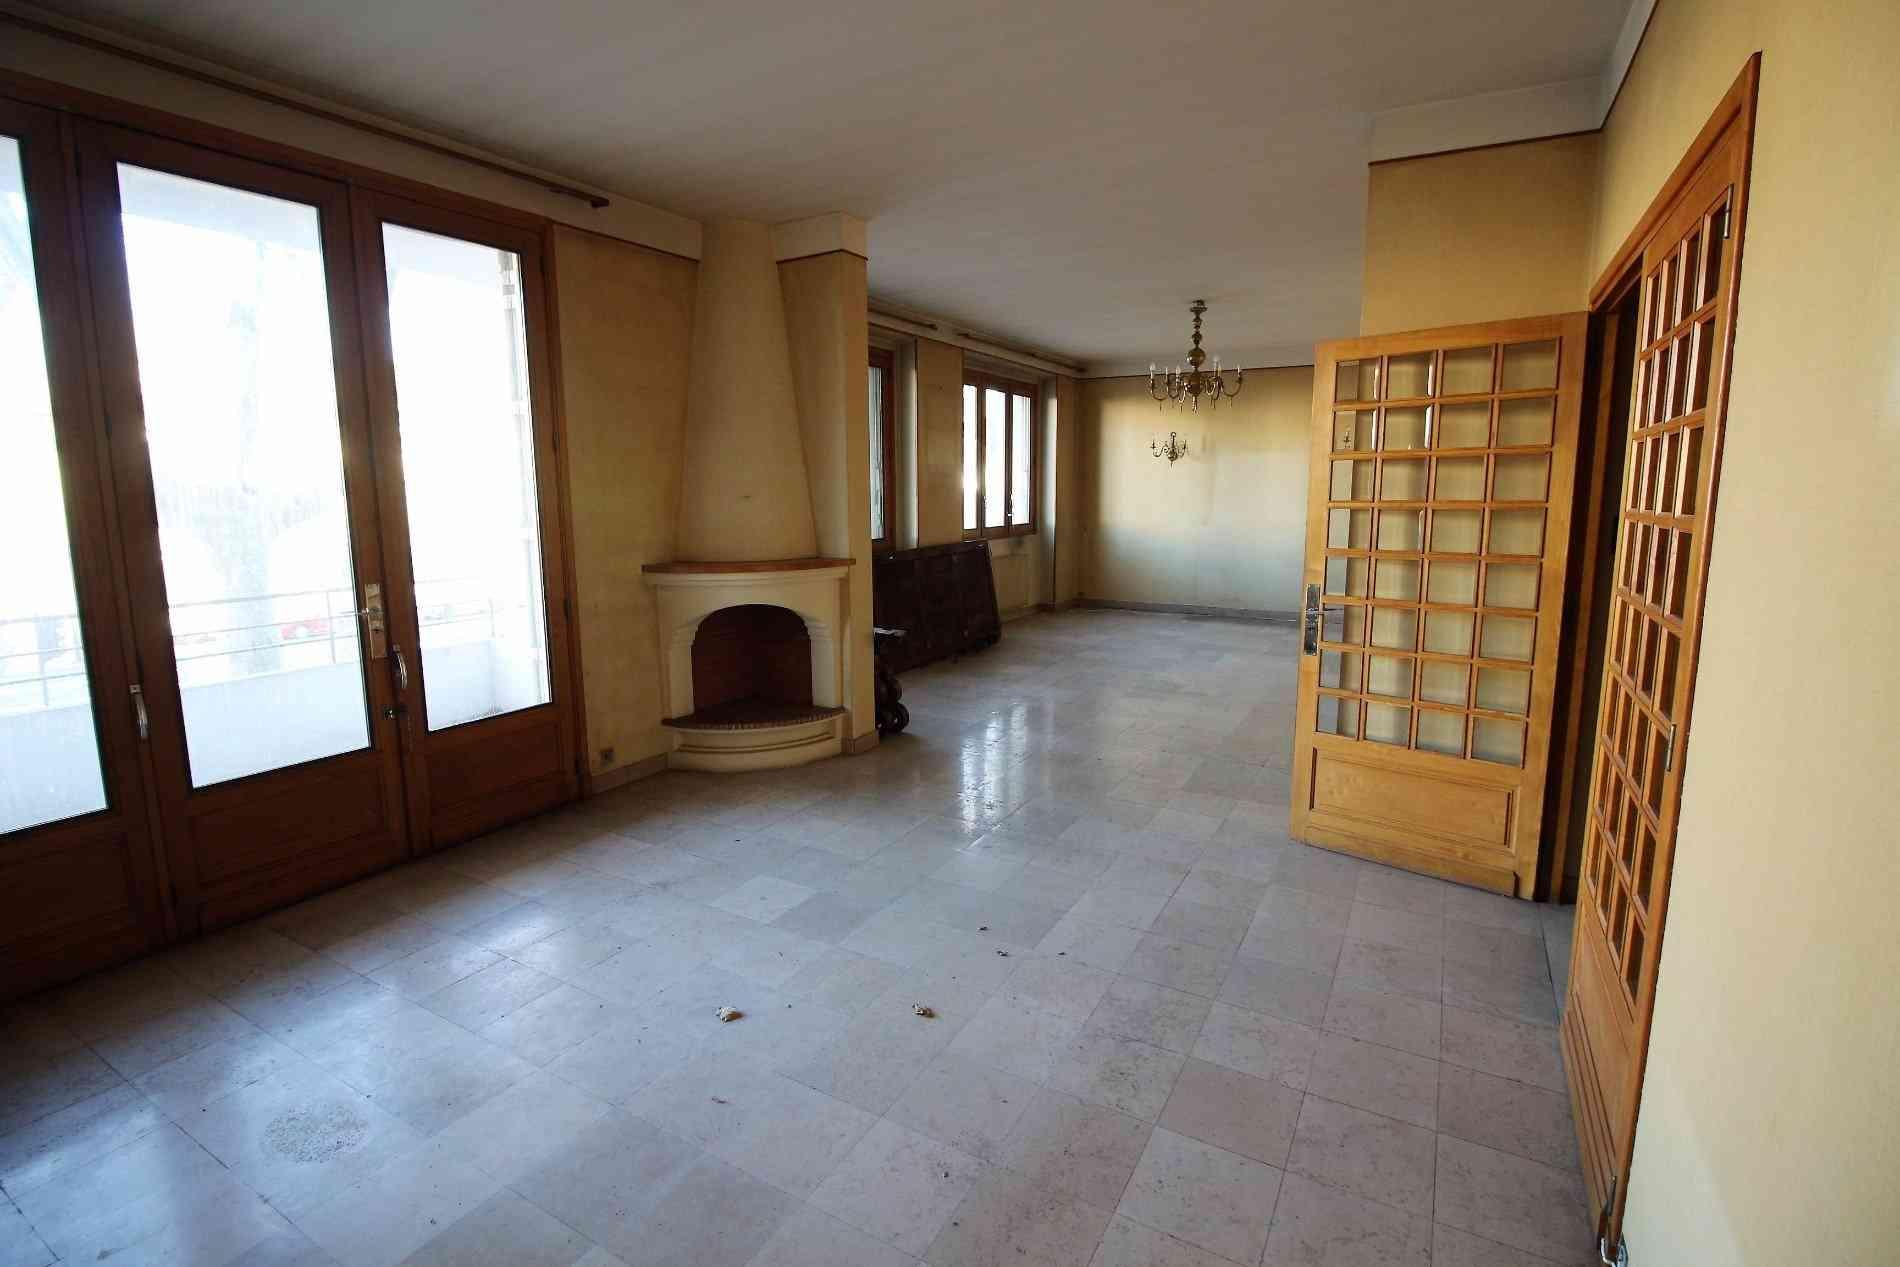 Apartment CARCASSONNE | 129 000 €